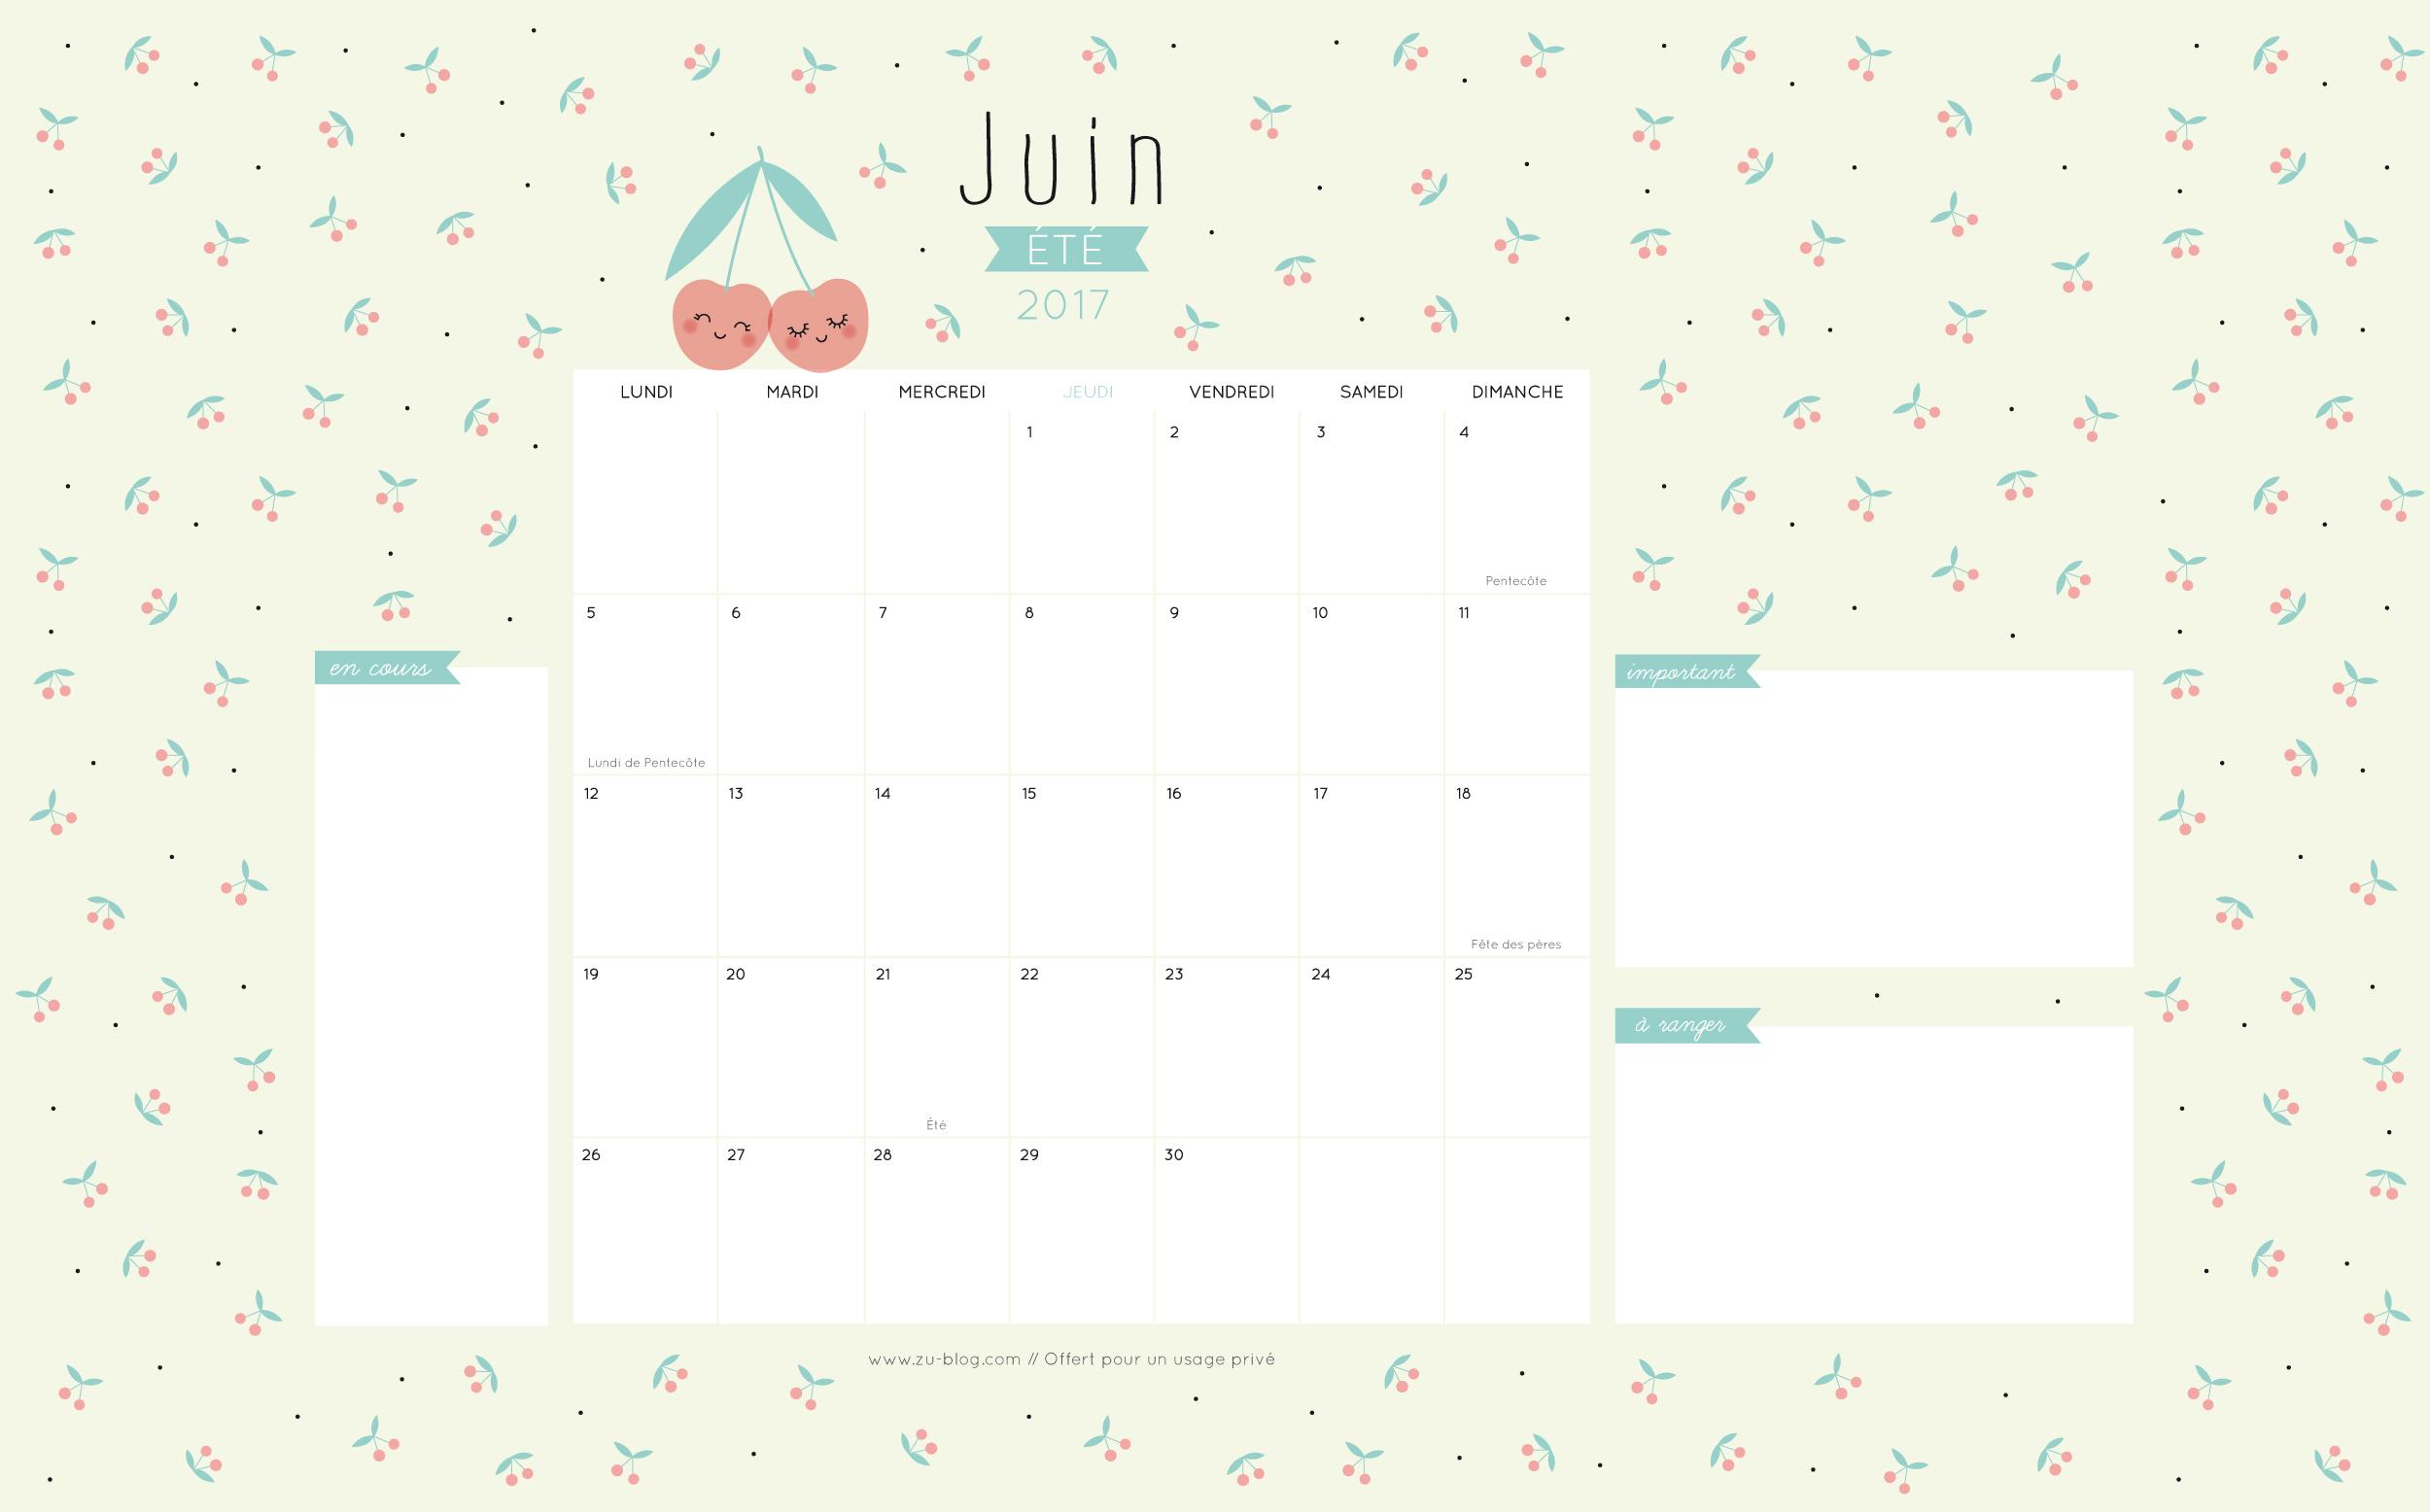 Calendar Zu : Le calendrier diy zü